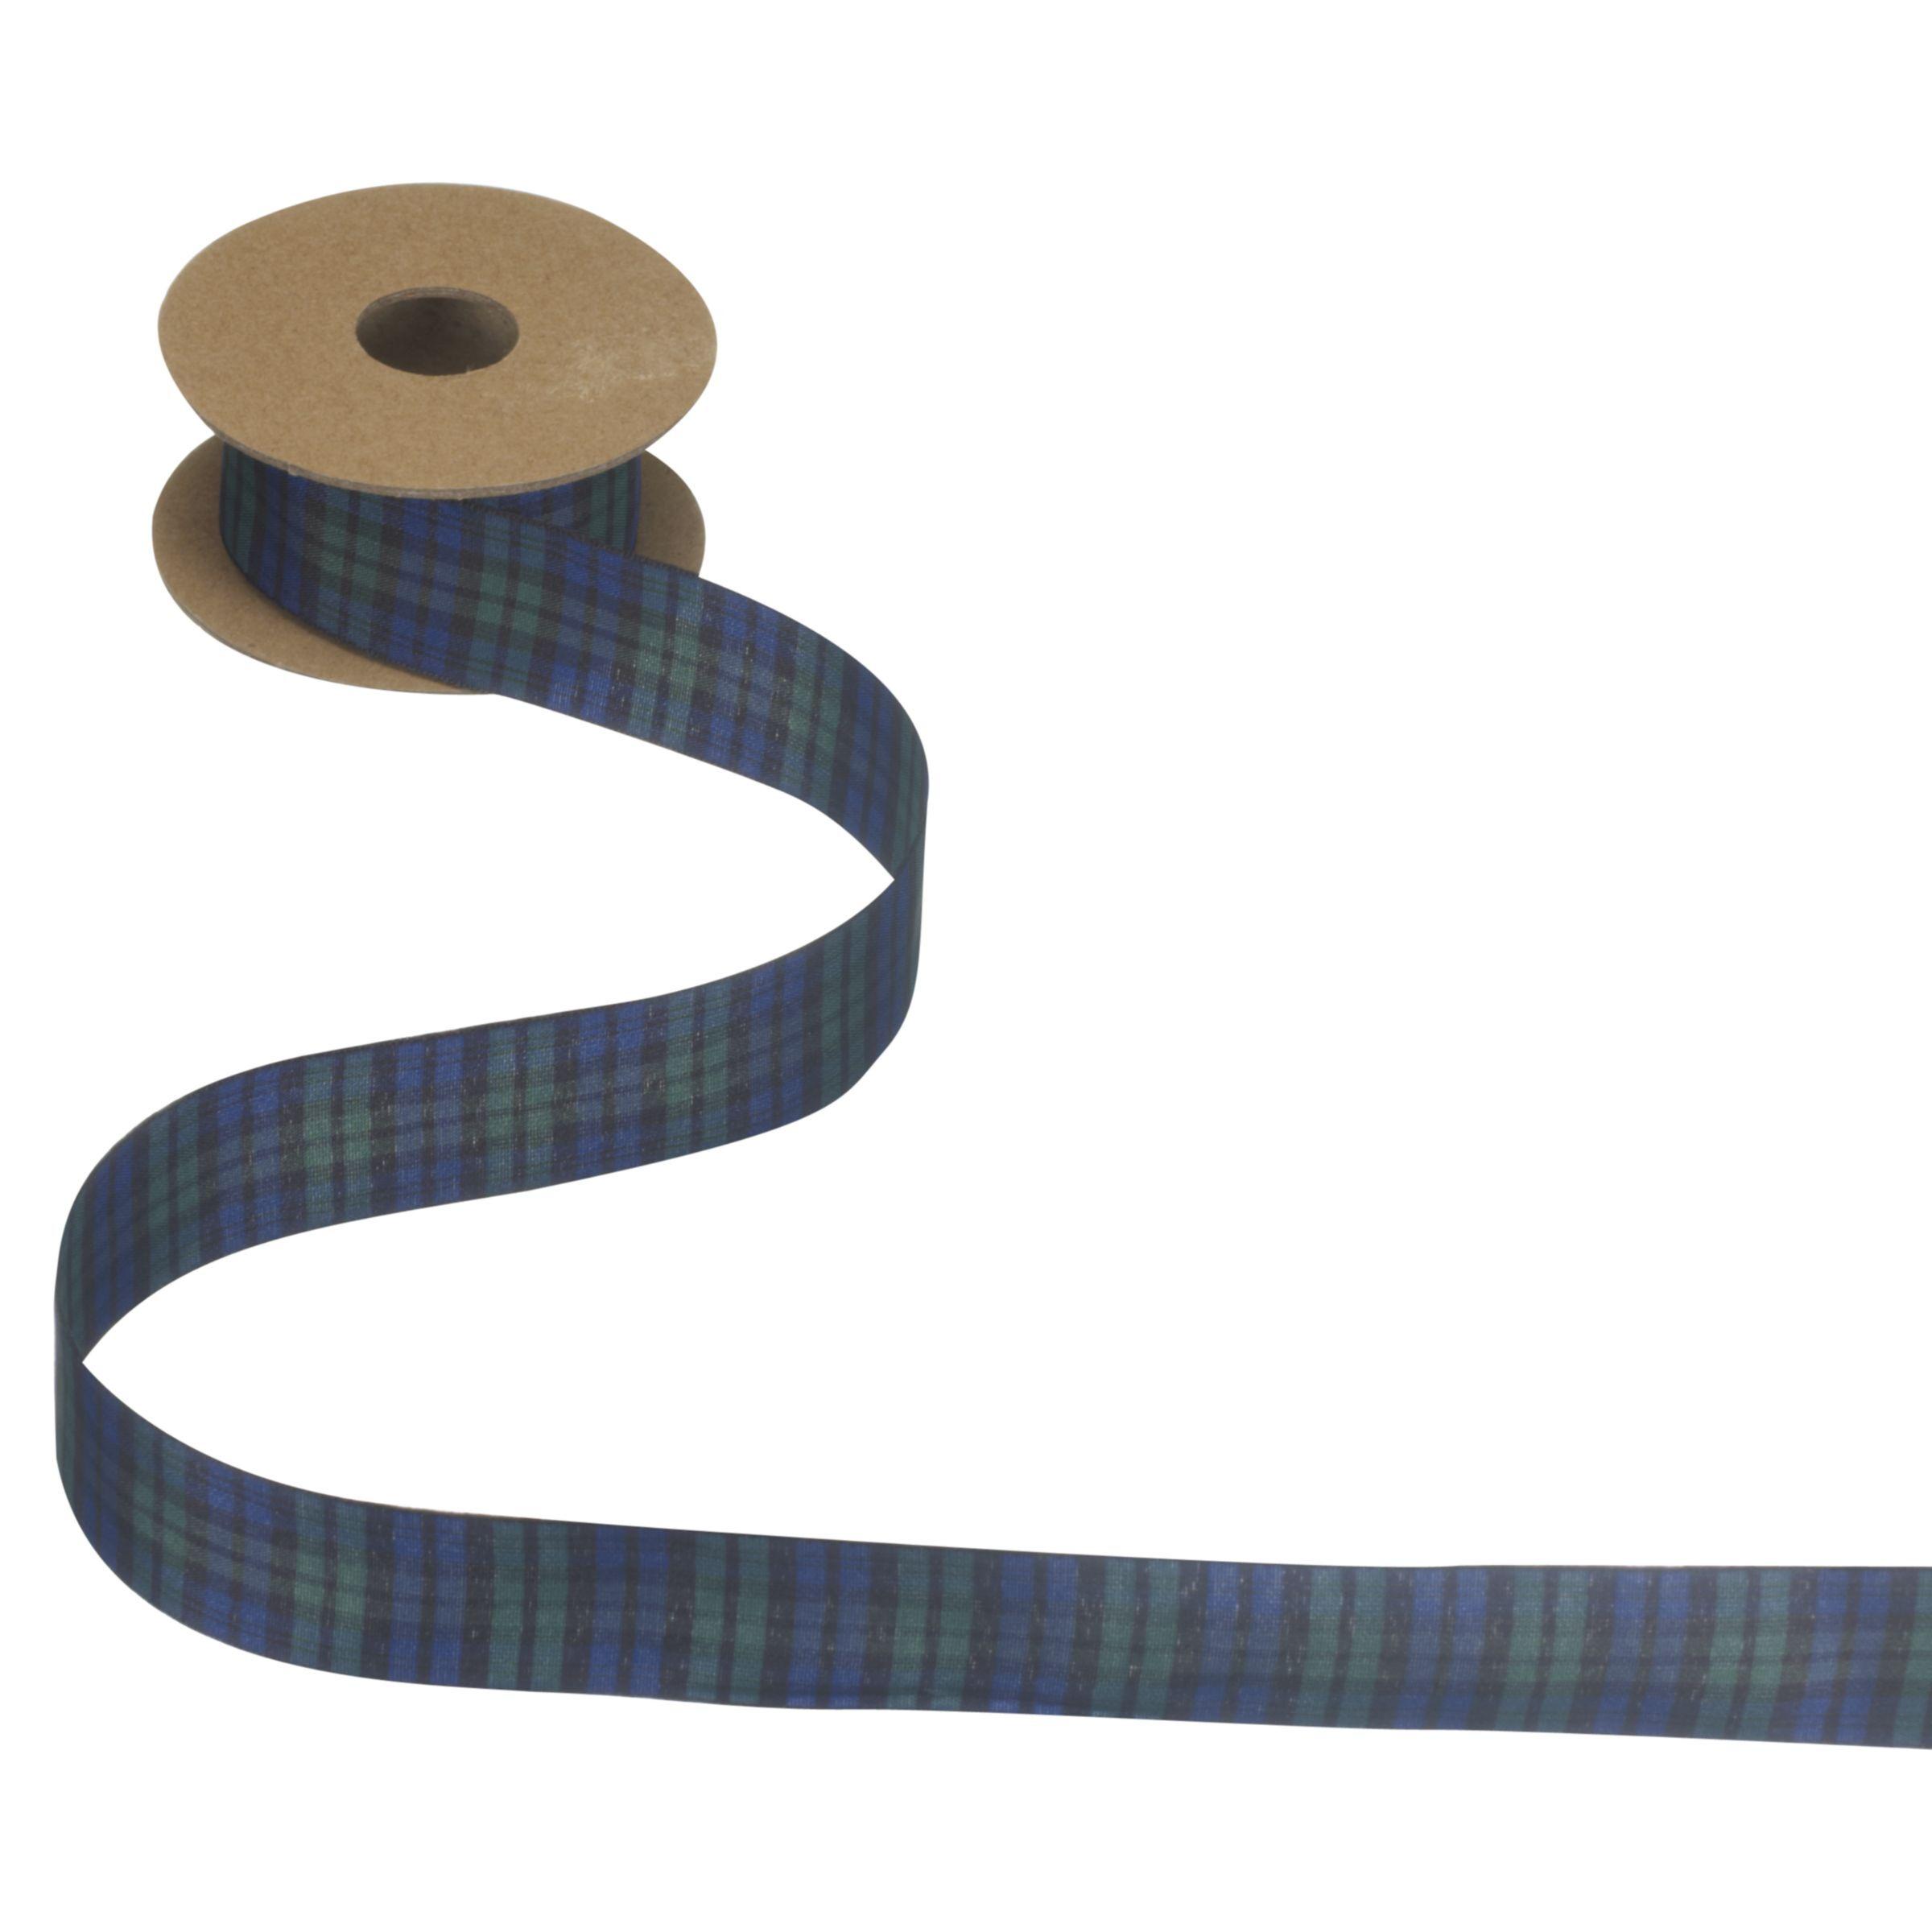 John Lewis & Partners Tartan Ribbon, 5m  - Black Watch - Size: 16mm